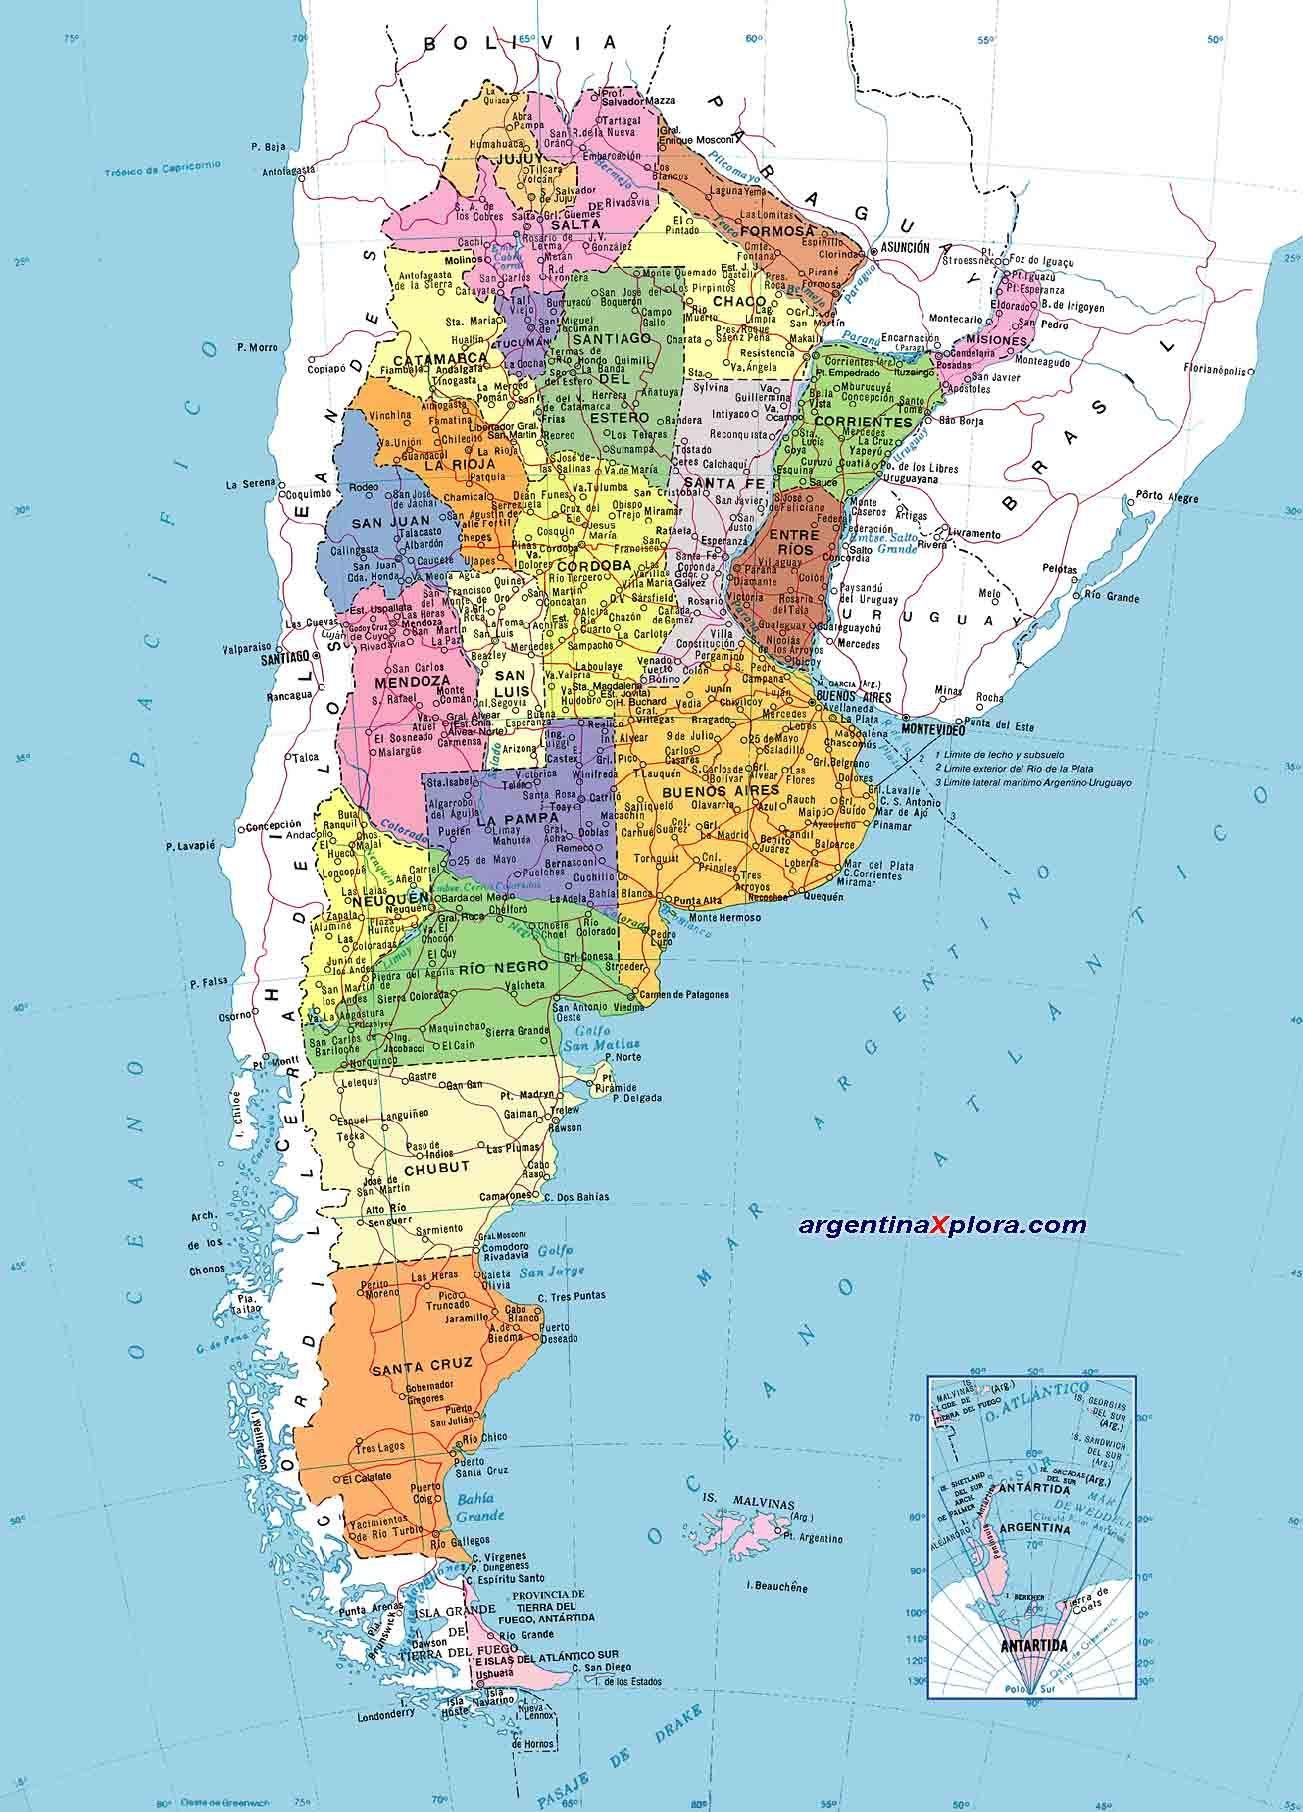 Argentina political map argentina bucket list postcard travelers argentina political map gumiabroncs Images